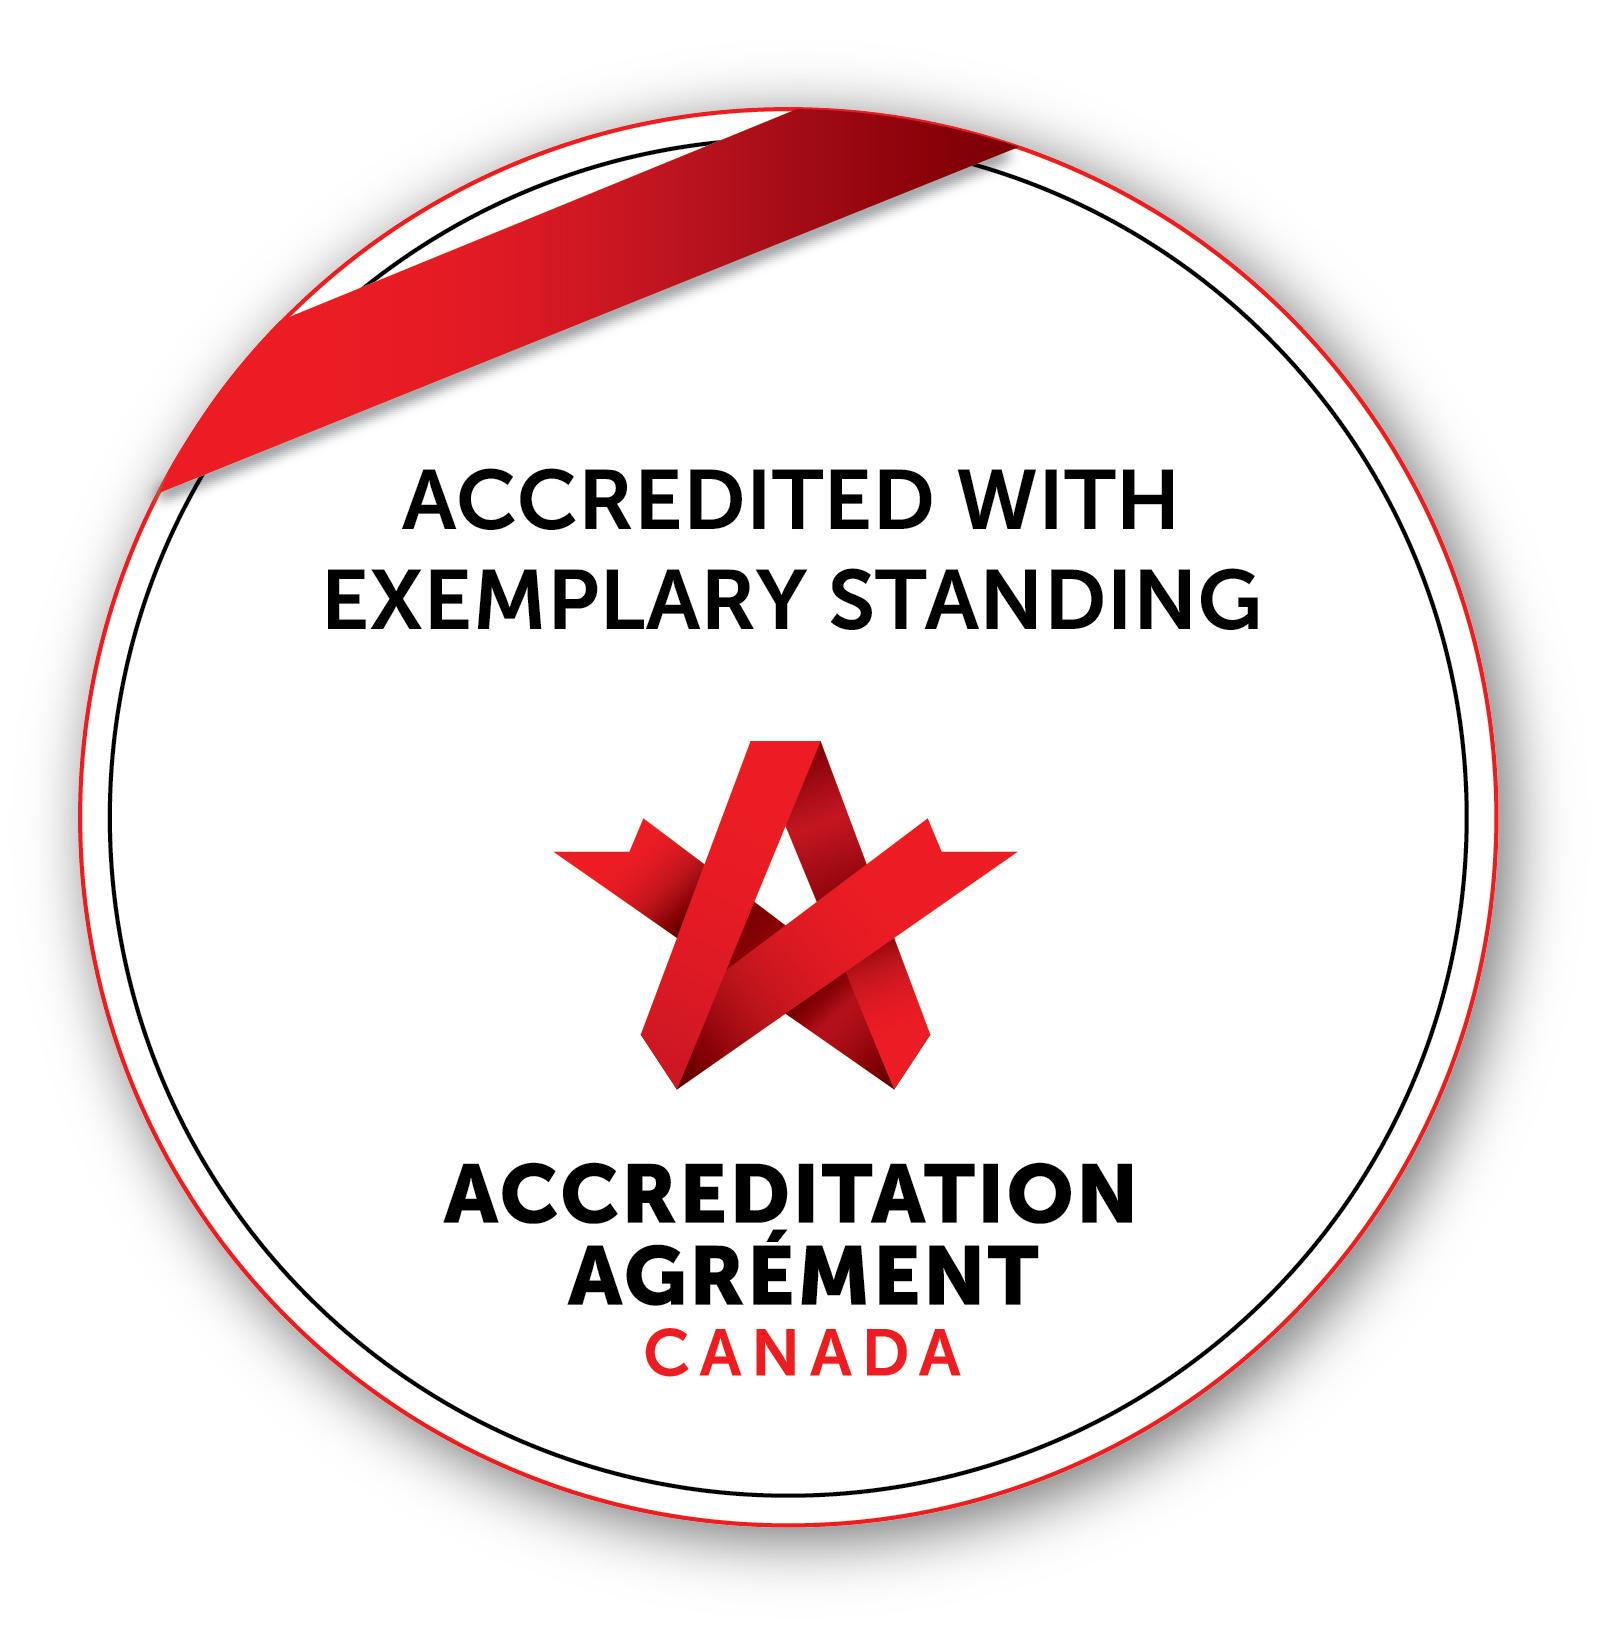 Acreditation Canada Seal - Exemplary Status